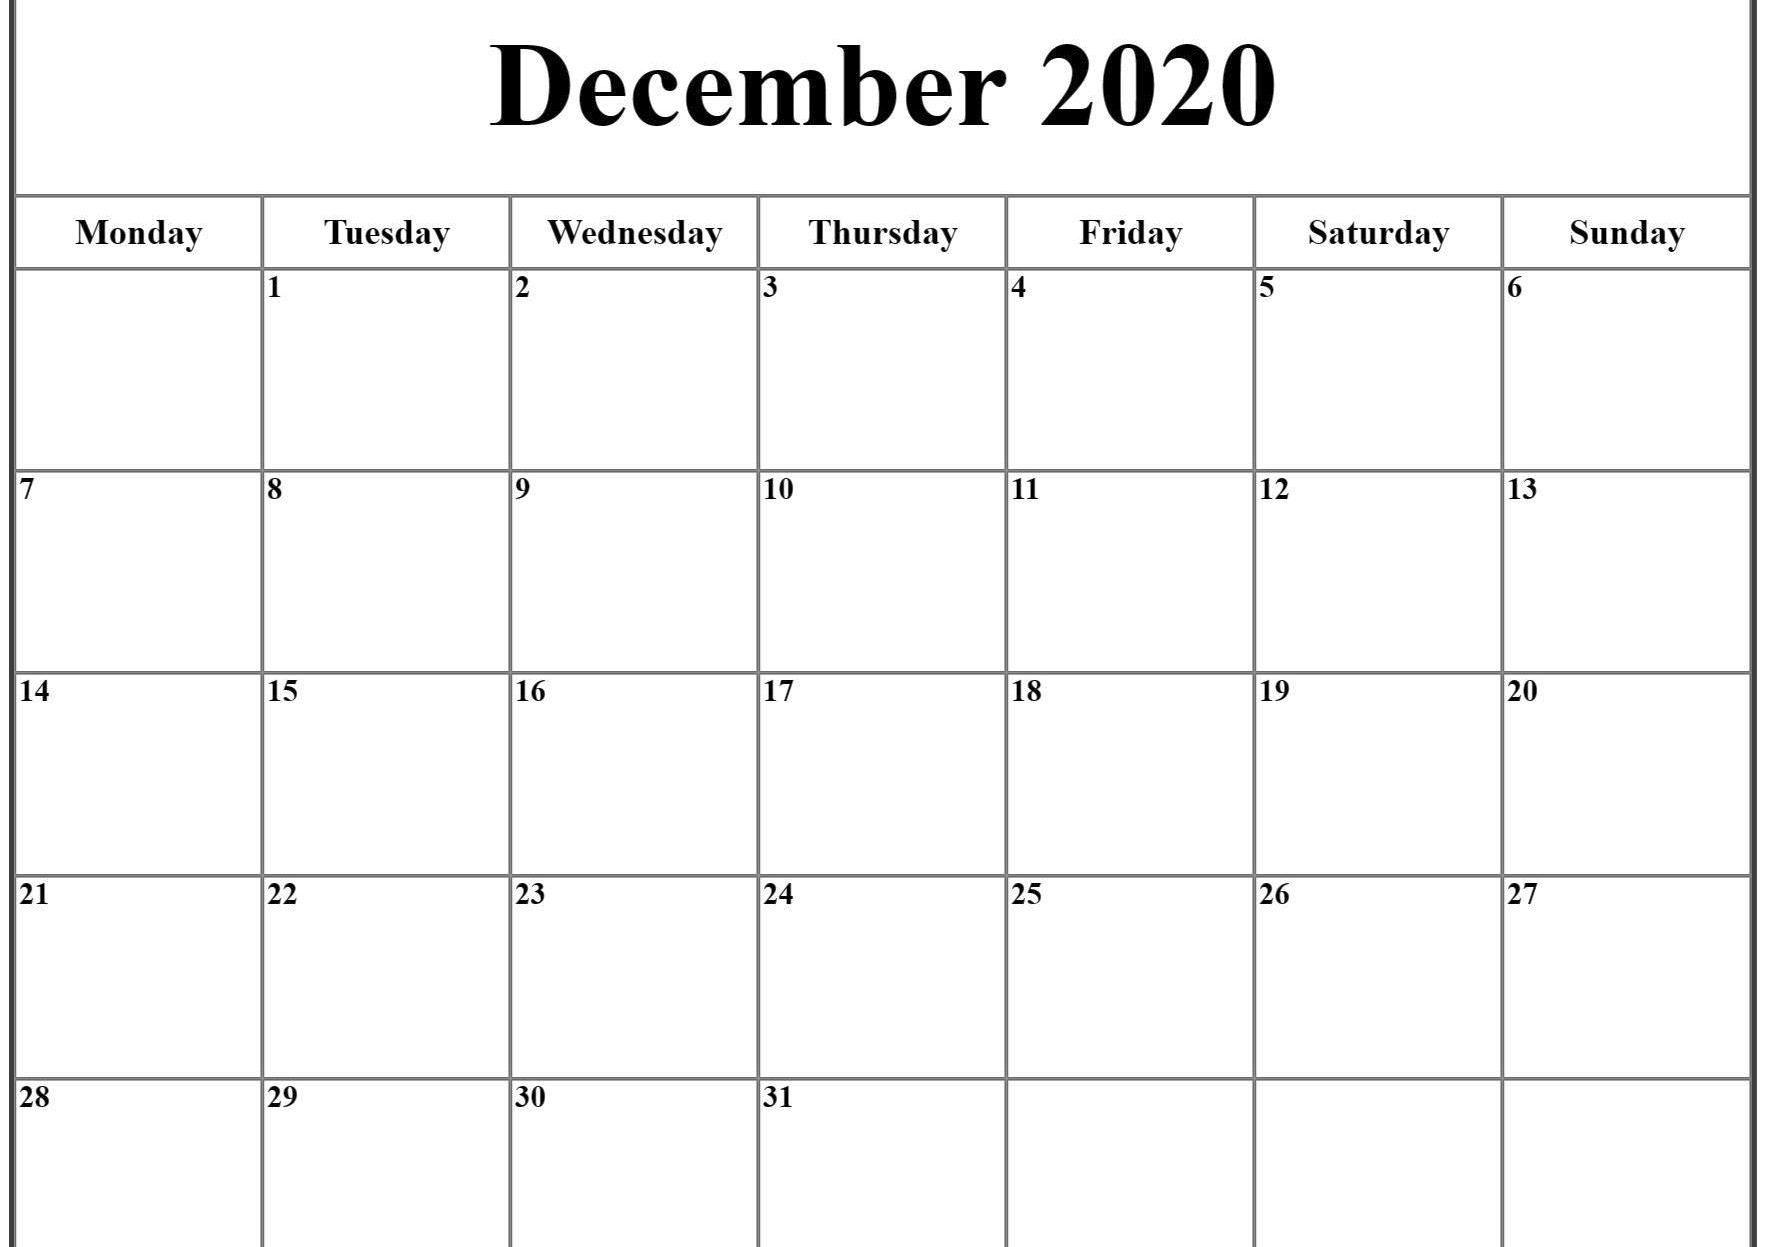 December 2020 Calendar